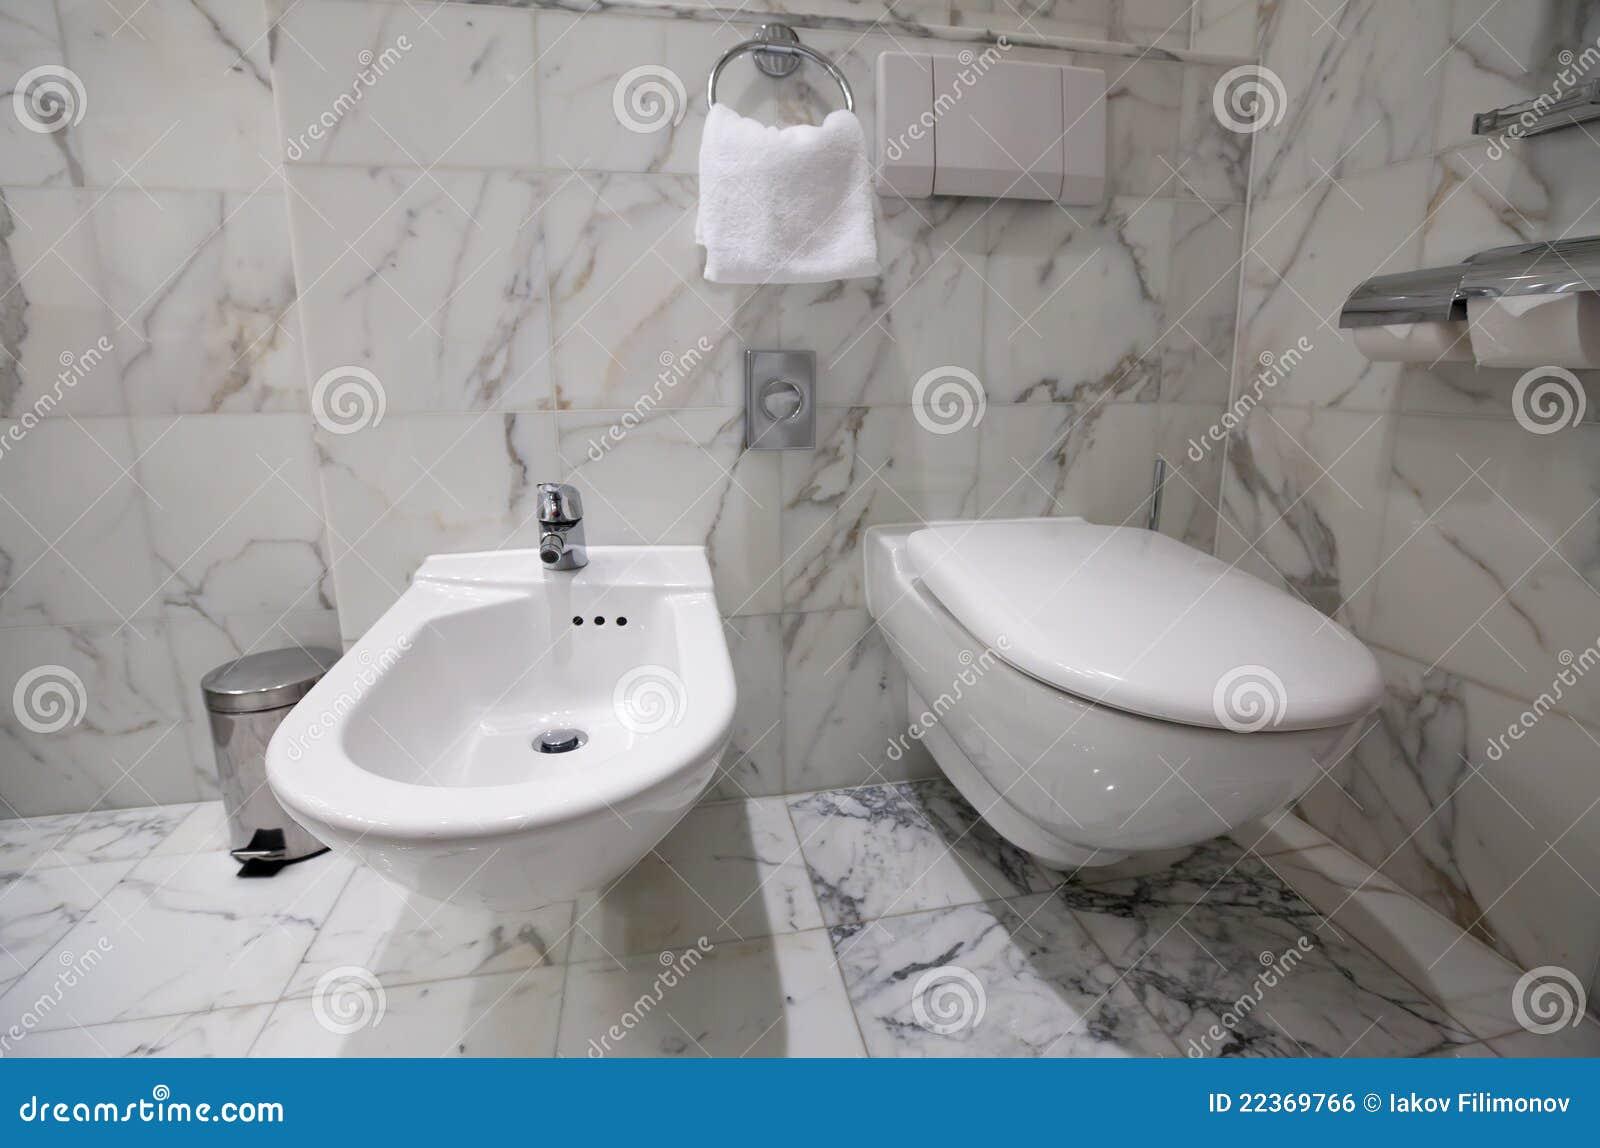 Toilet Bowl And Bidet Stock Photo Image Of Modern Flush